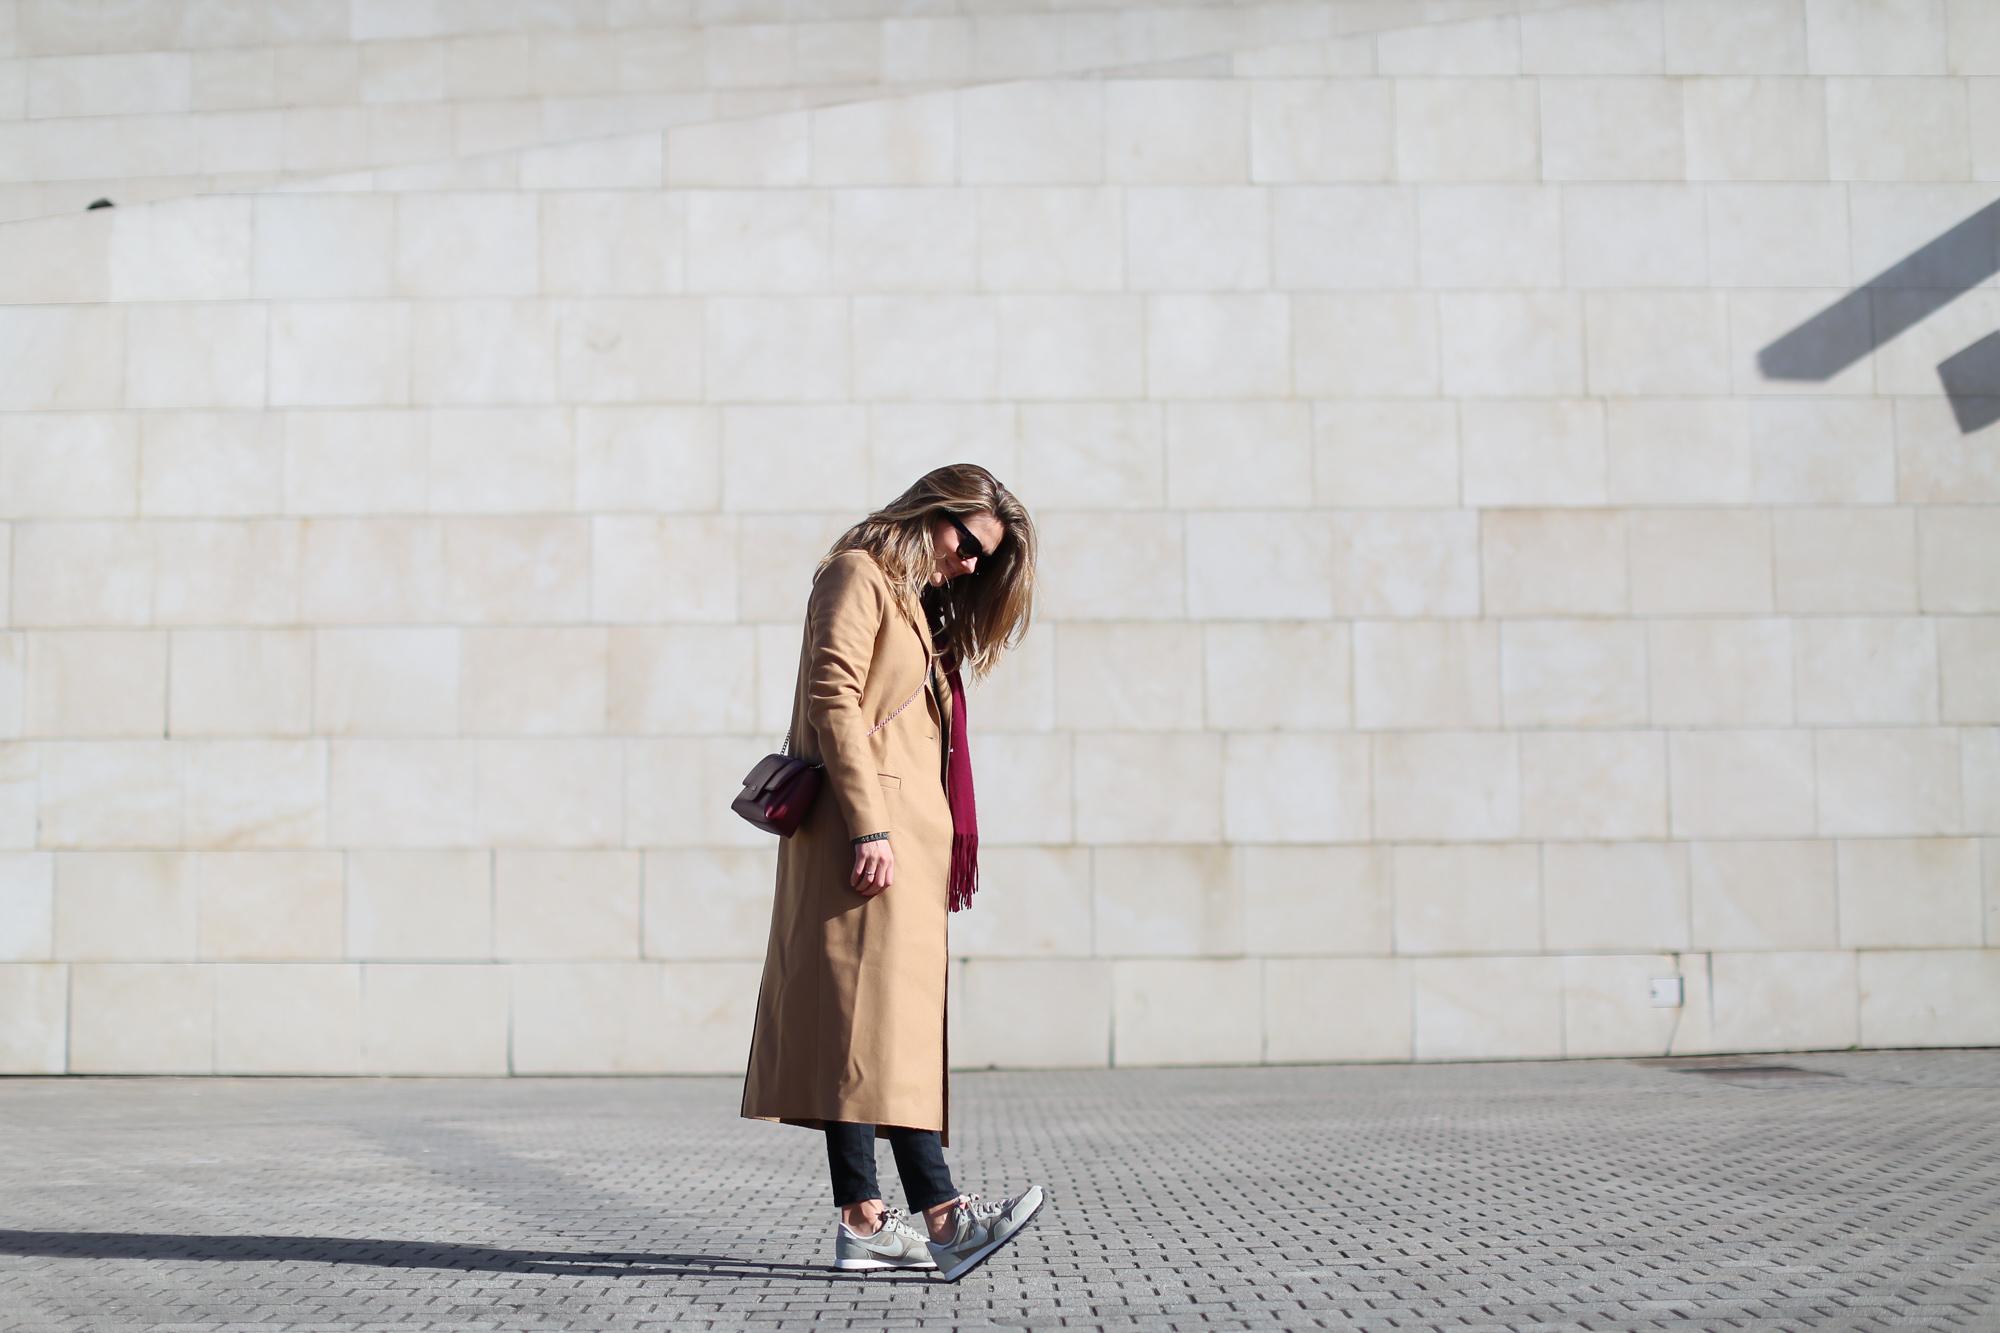 Clochet_streestyle_fashionblogger_&otherstories_abrigocamel_nikepegasus_topshopjamiejeans-3